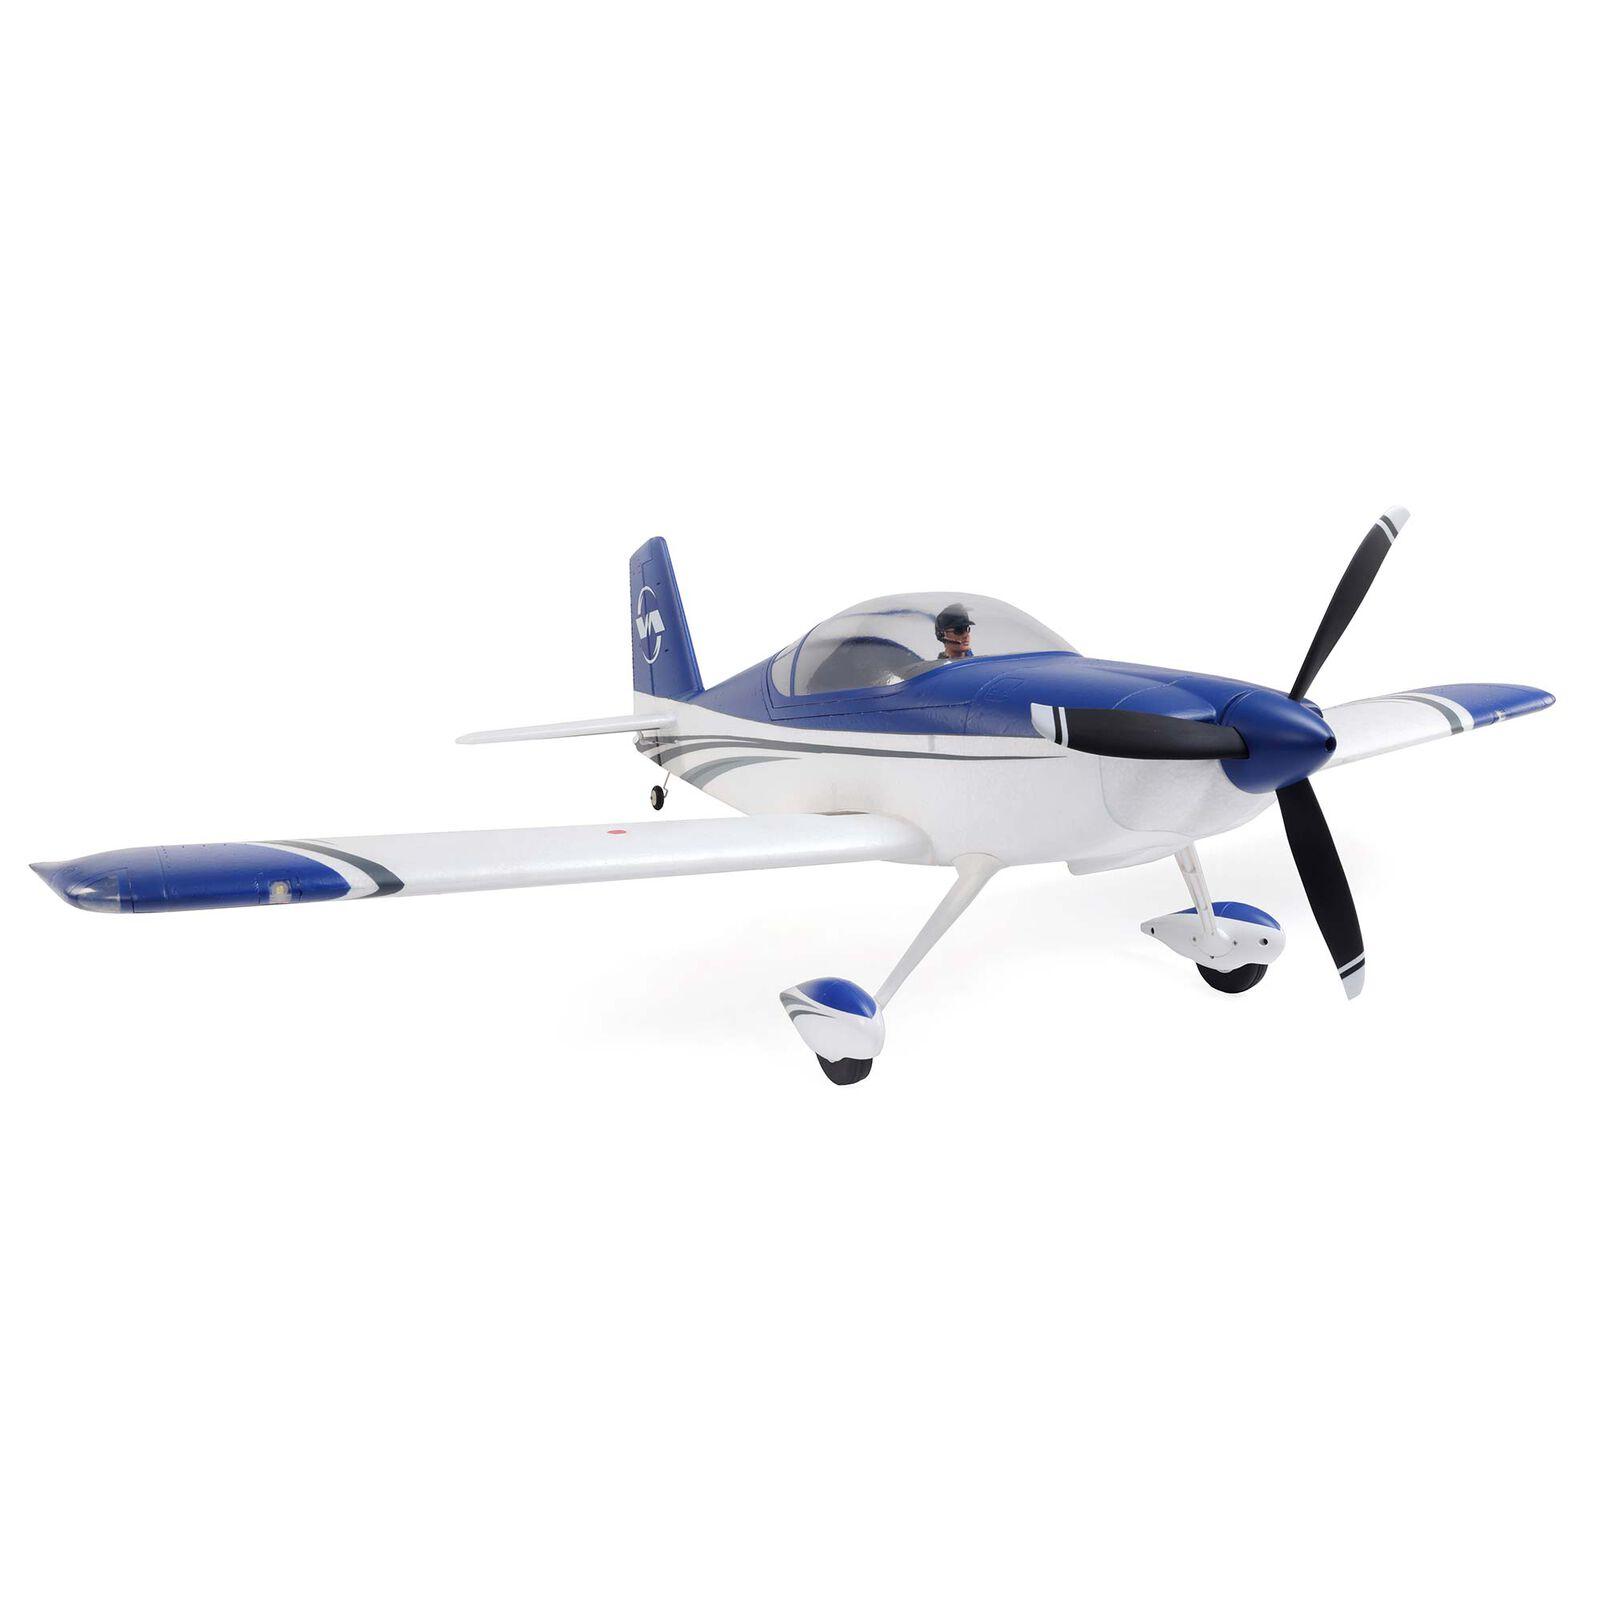 RV-7 E-flite